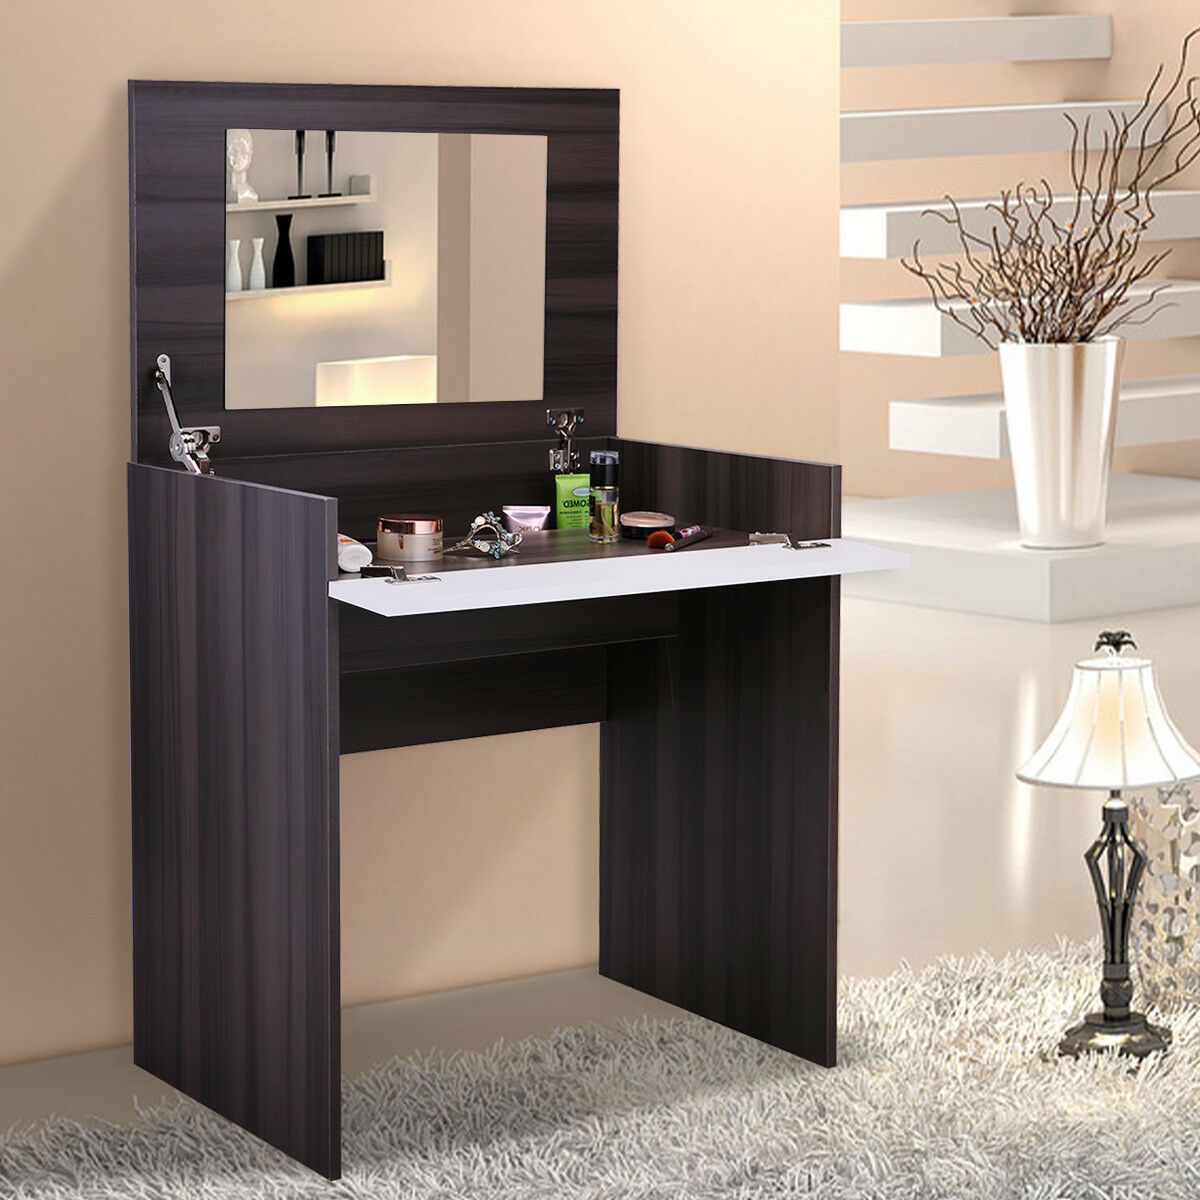 lowestbest dressing table vanity ebony white dressing vanity table desk for bedroom bathroom closet hallway makeup vanity table with flip up